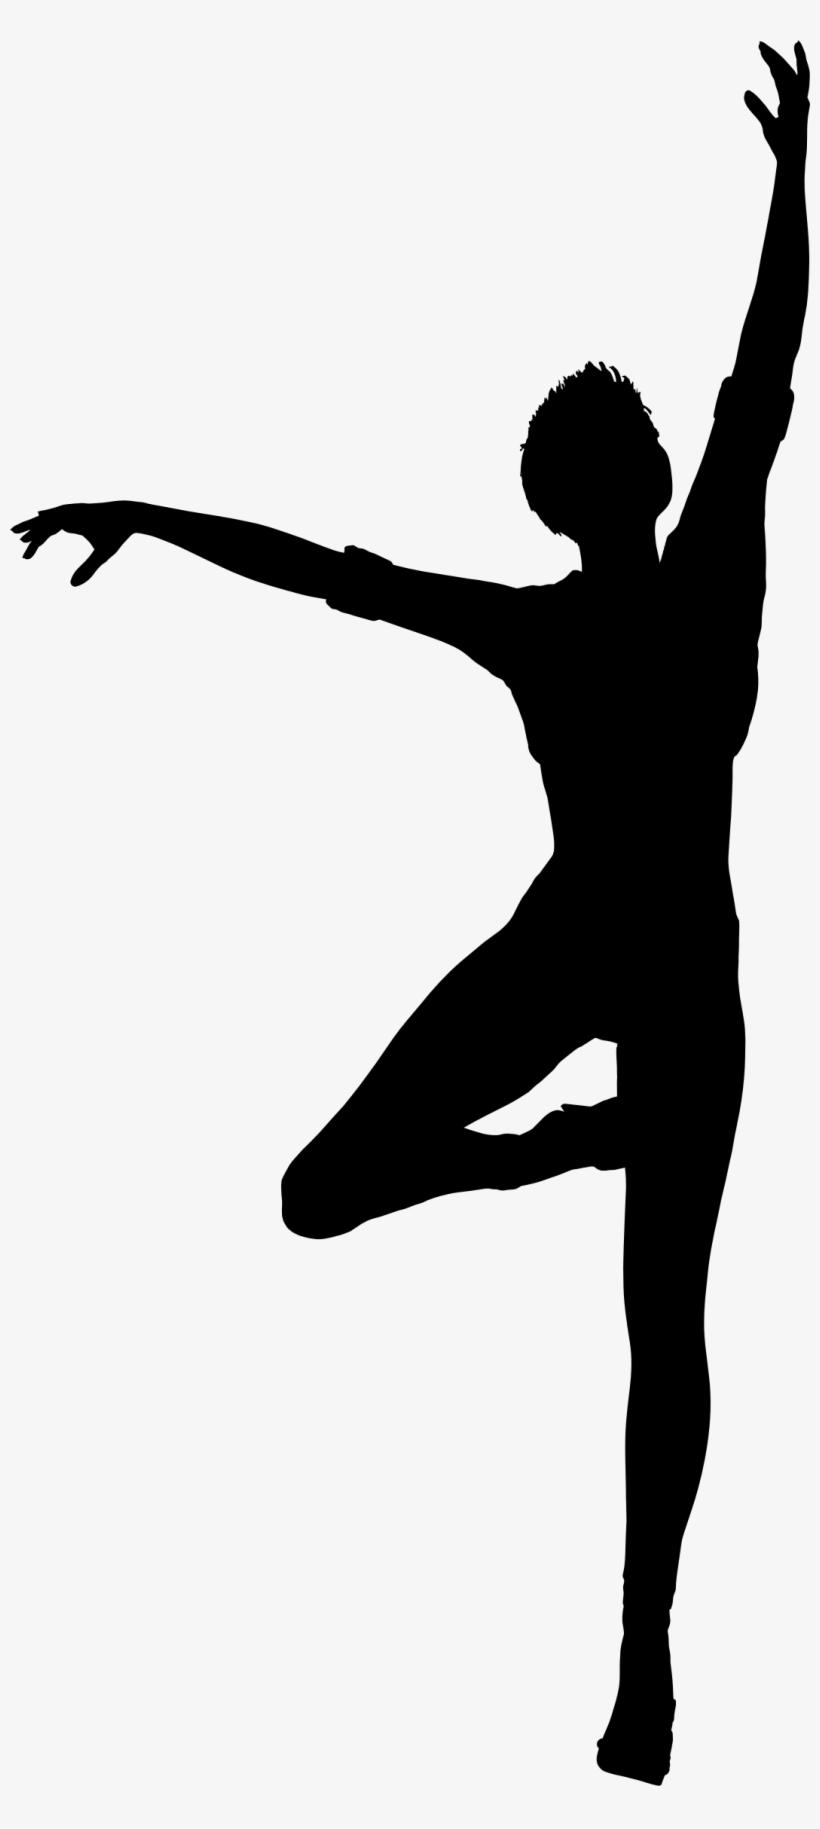 Clipart - Dancing Woman Silhouette, transparent png #156854